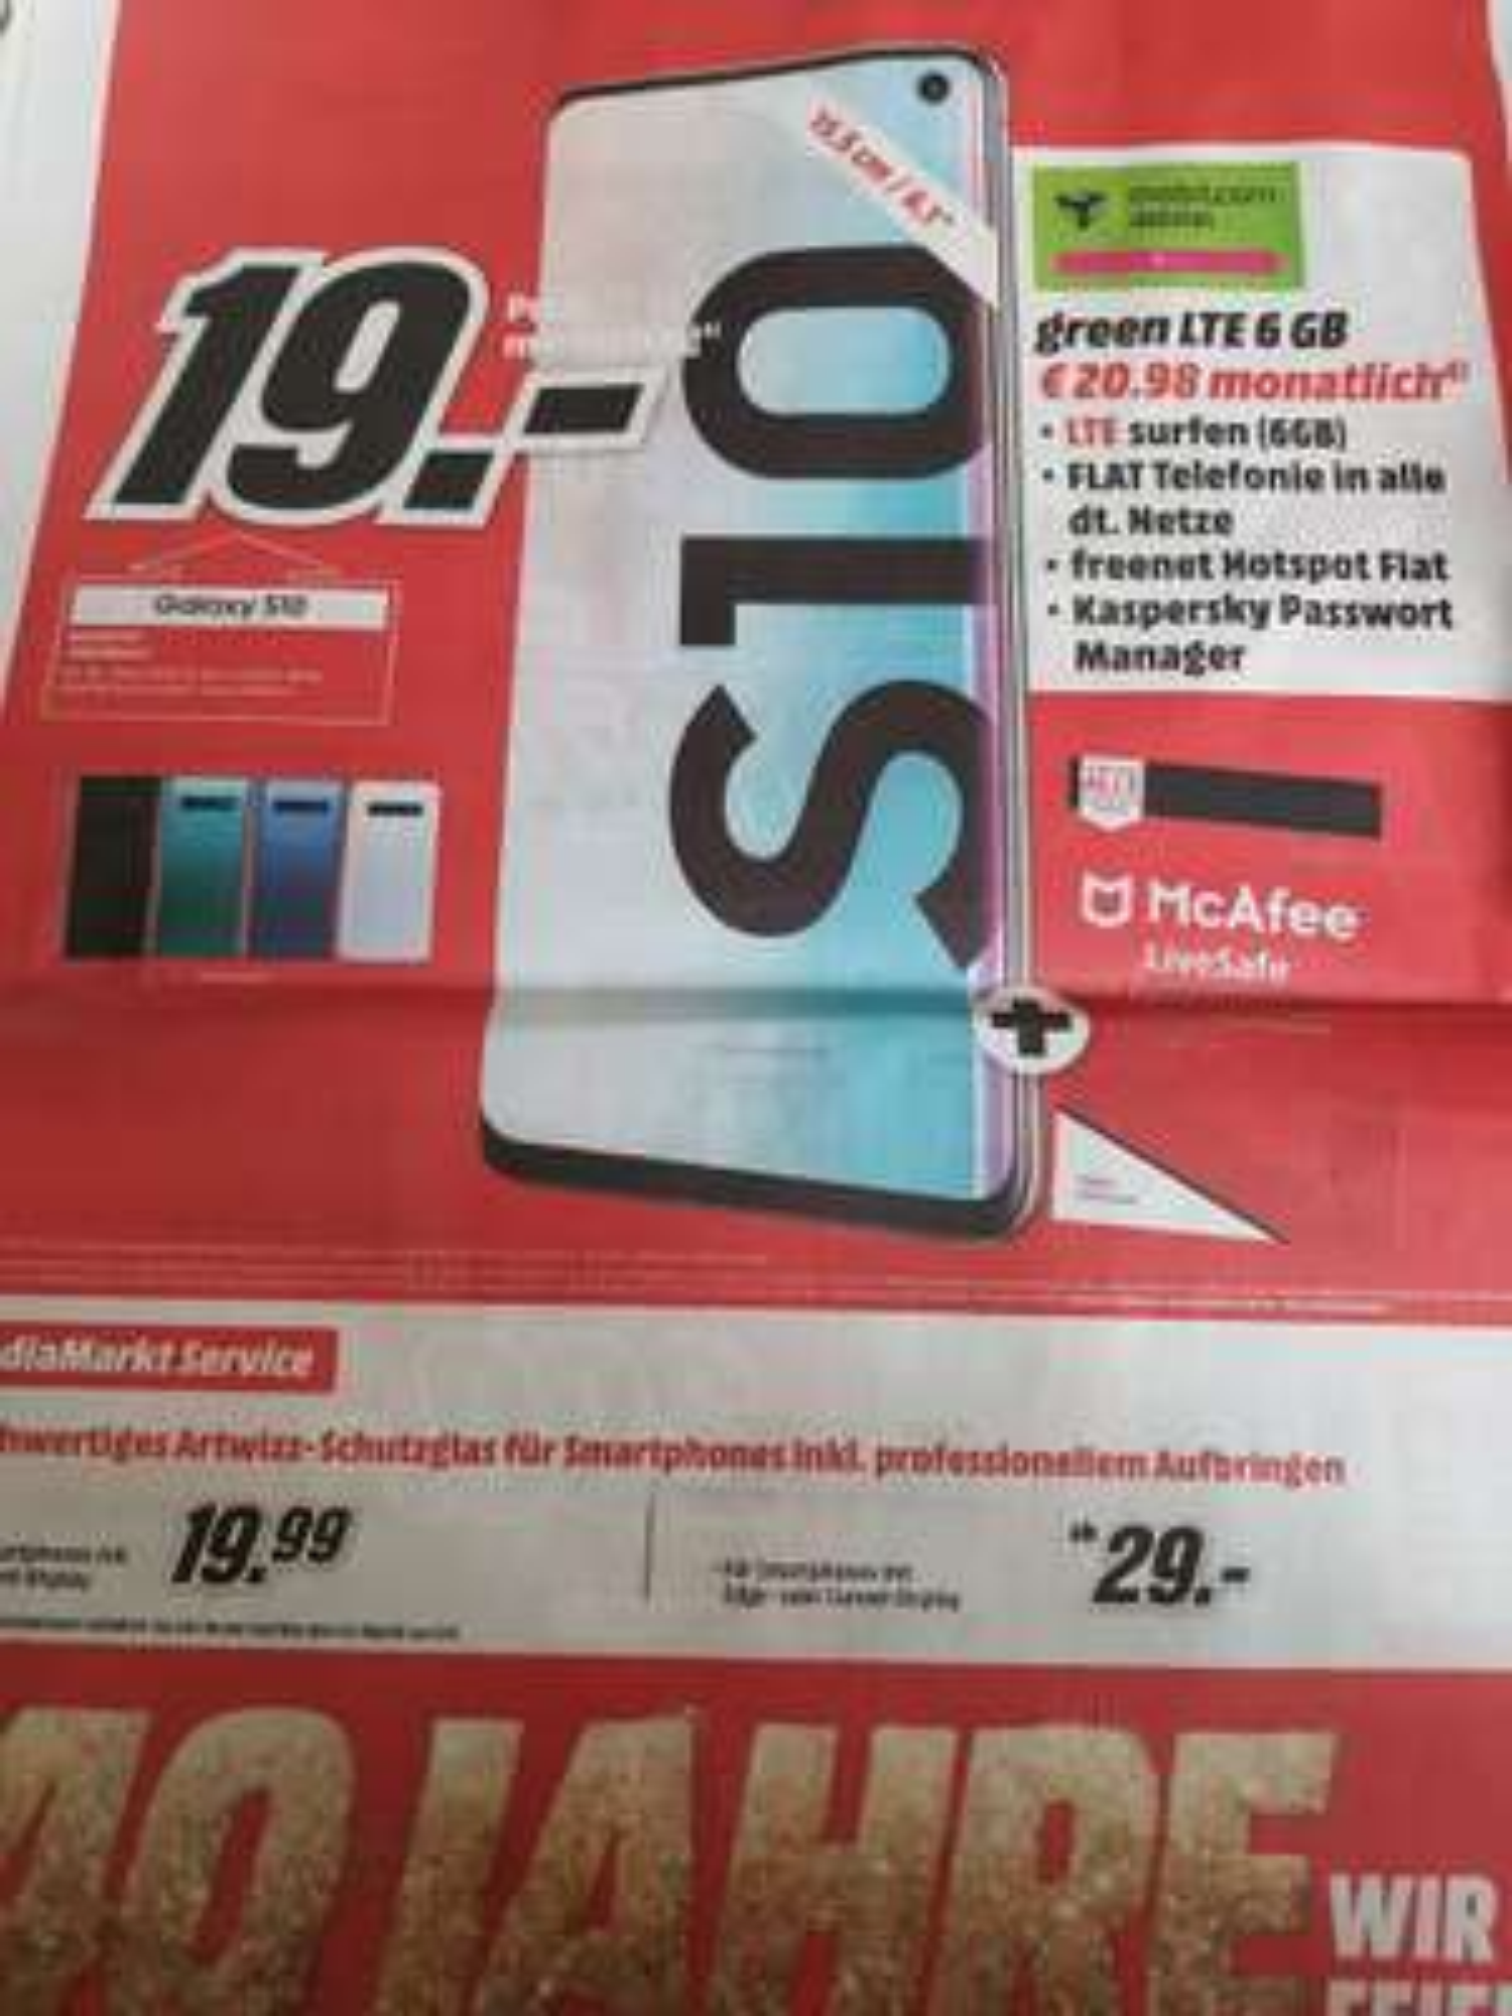 [Lokal Media Markt Lüneburg] Samsung Galaxy s10 Vertrag 6GB LTE mobilcom debitel im Telekom Netz